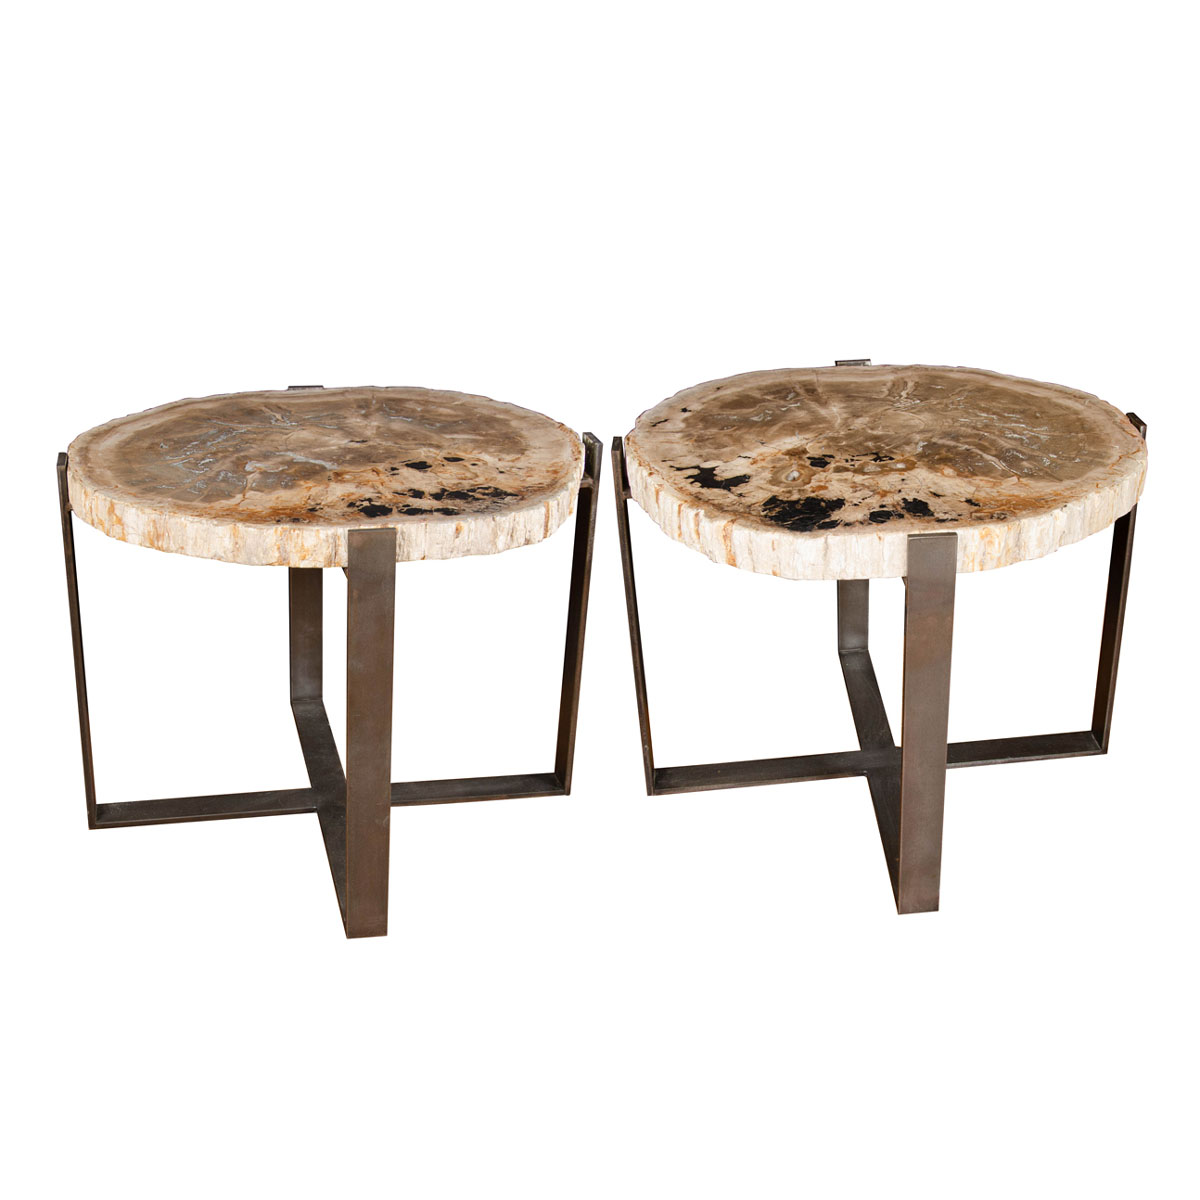 Pair Of Petrified Wood Tables Side End Tables John Salibello